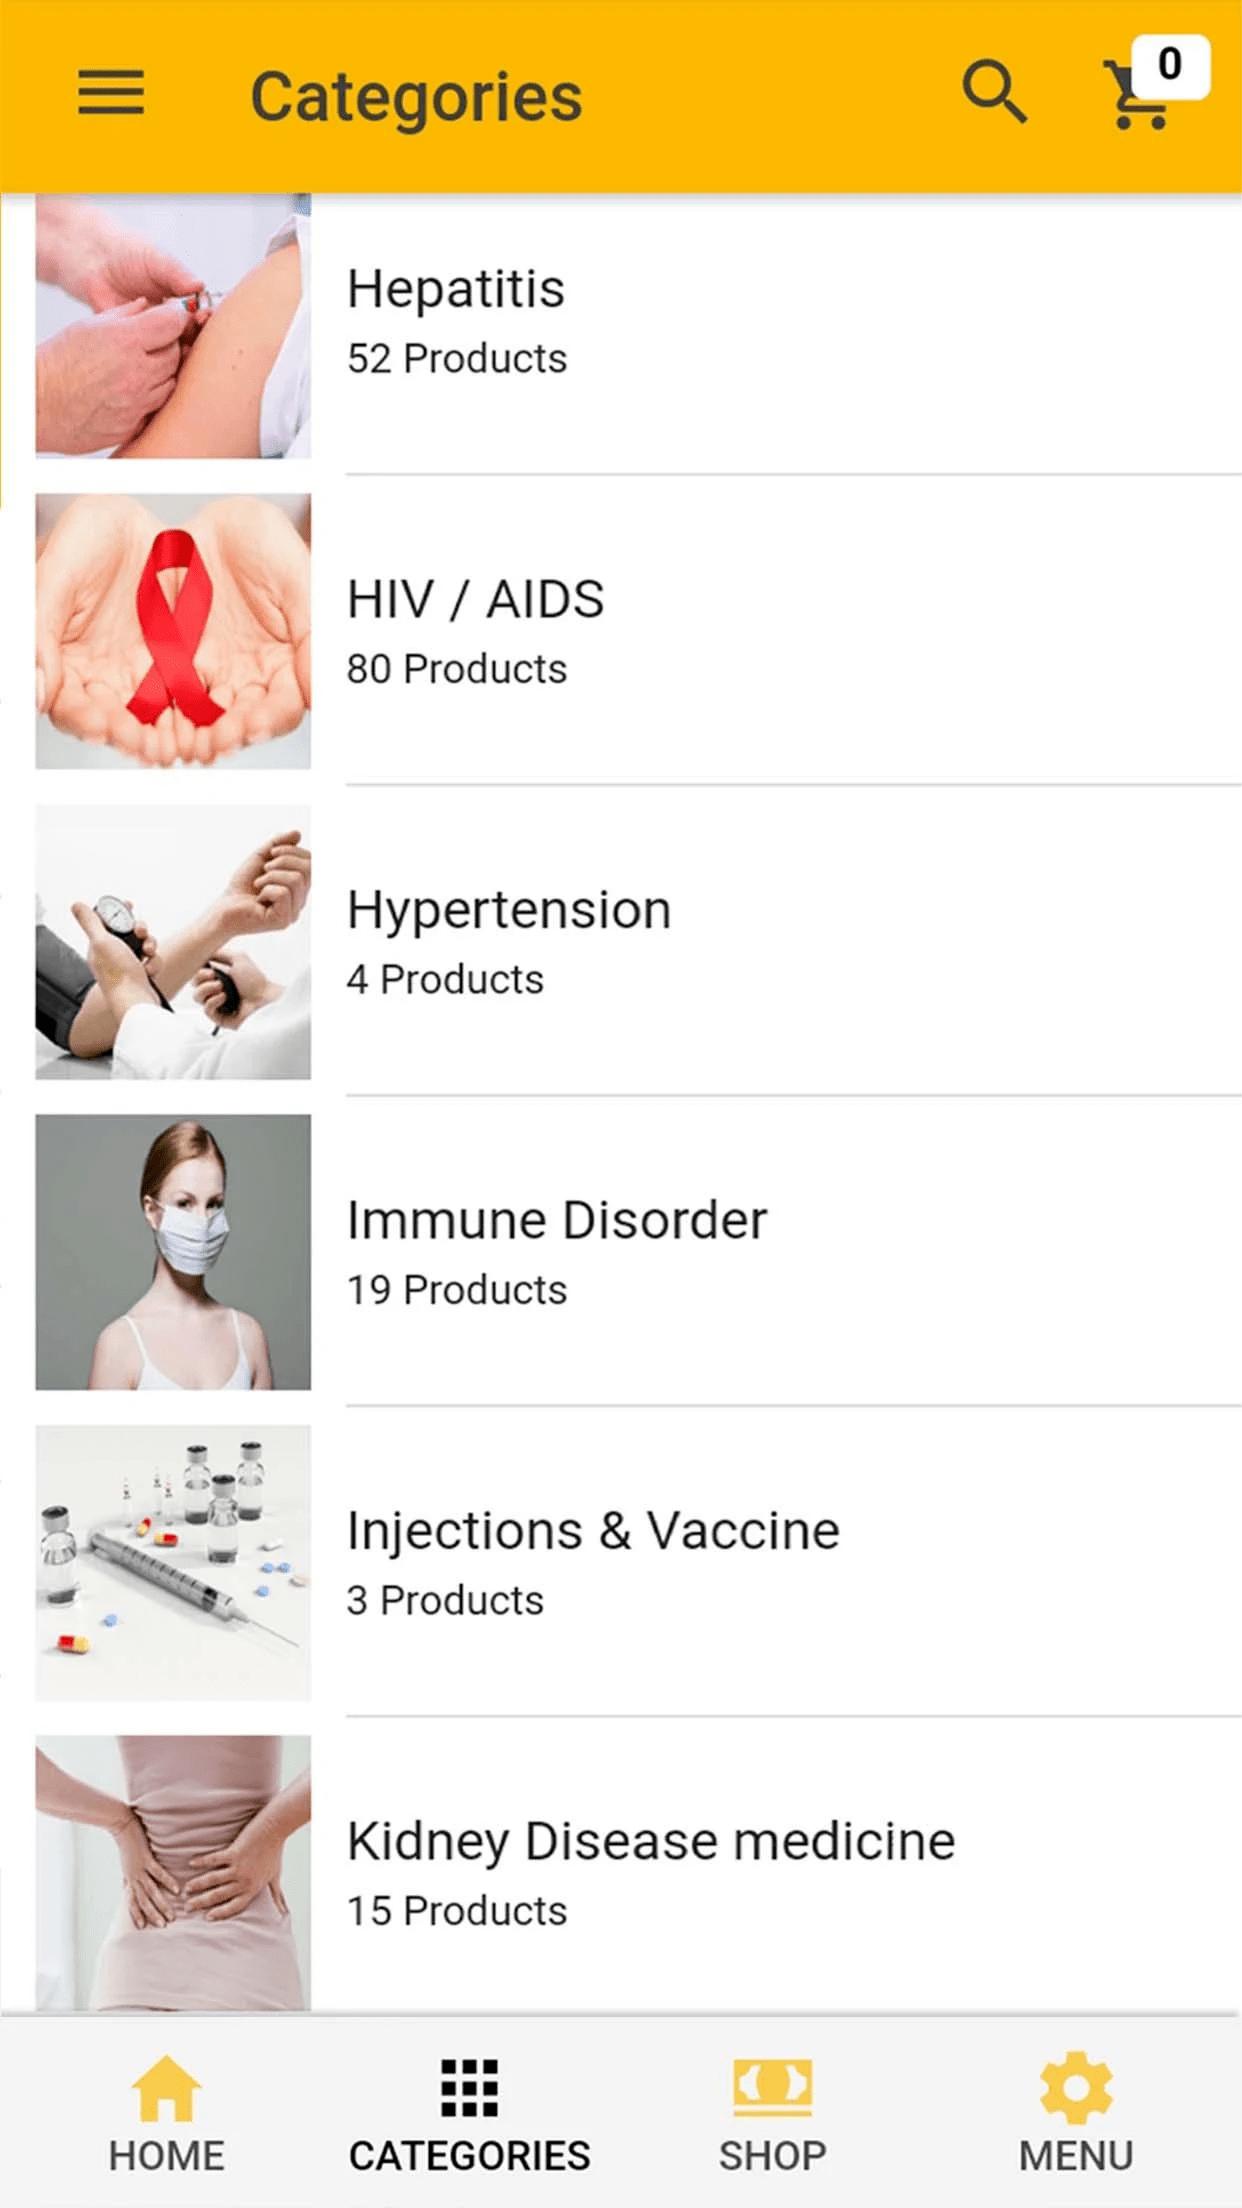 PillsBills - Specialty Online Pharmacy